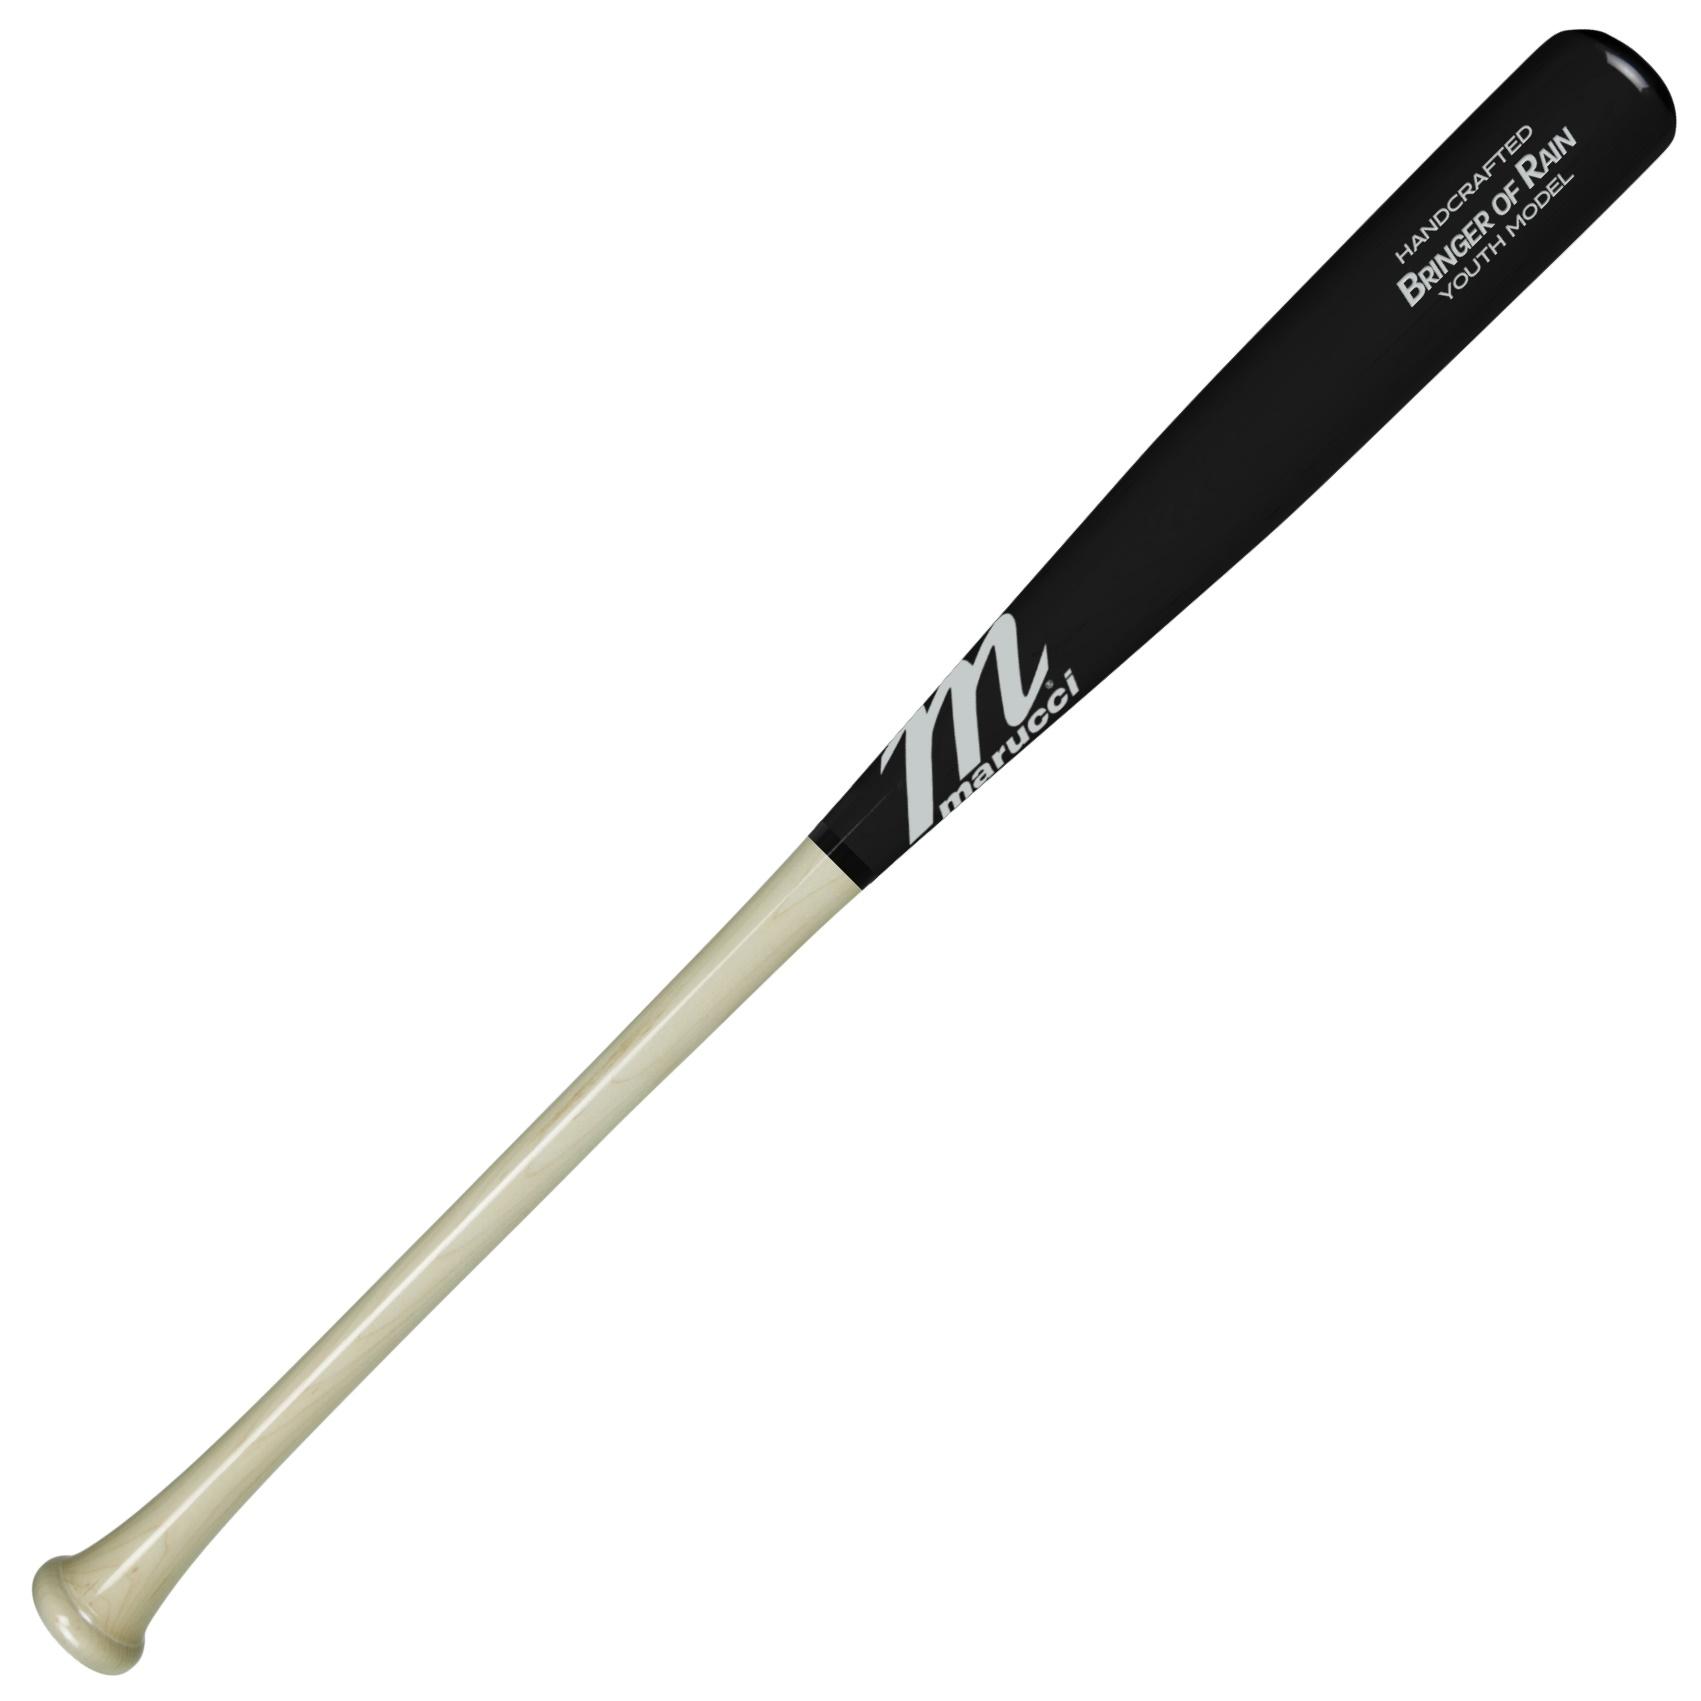 marucci-bringer-of-rain-youth-maple-wood-baseball-bat-26-inch MYVE2BOR-NBK-26 Marucci 840058700787 <h1 class=productView-title-lower>YOUTH JOSH DONALDSON BRINGER OF RAIN PRO MODEL</h1> <span>The Bringer